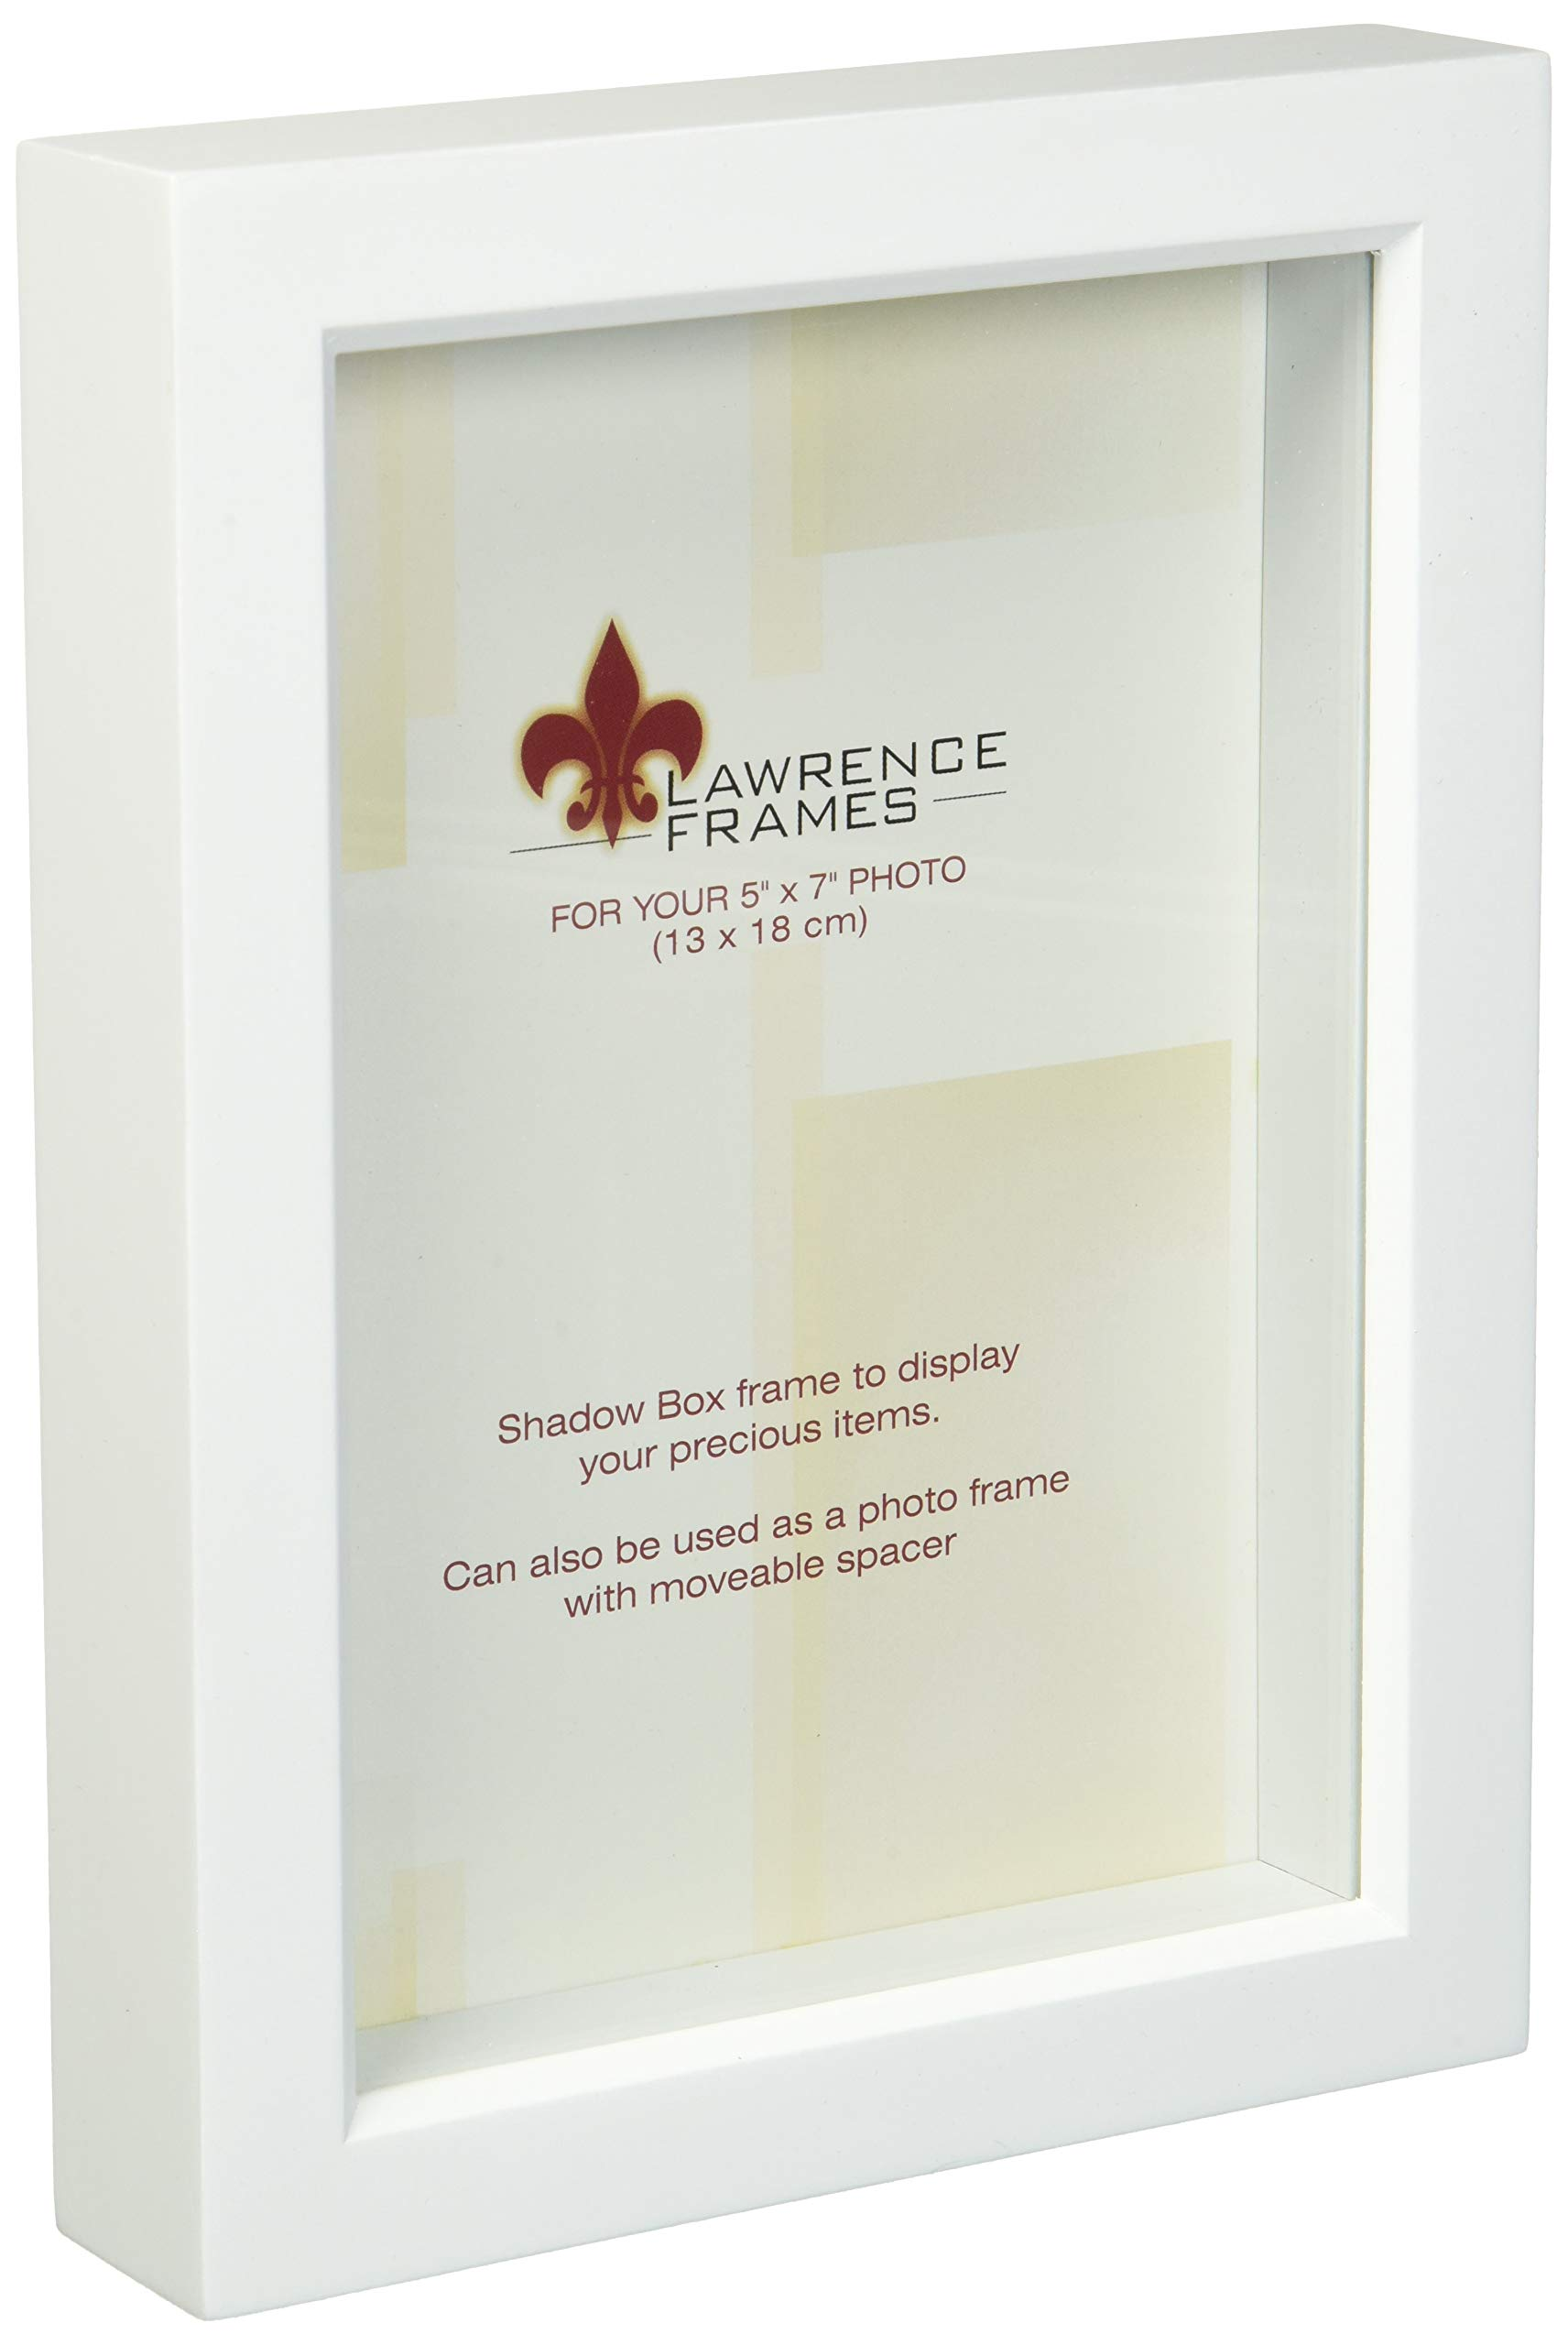 Lawrence Frames 795257 White Wood Treasure Box Shadow Box Picture Frame, 5 by 7-Inch by Lawrence Frames